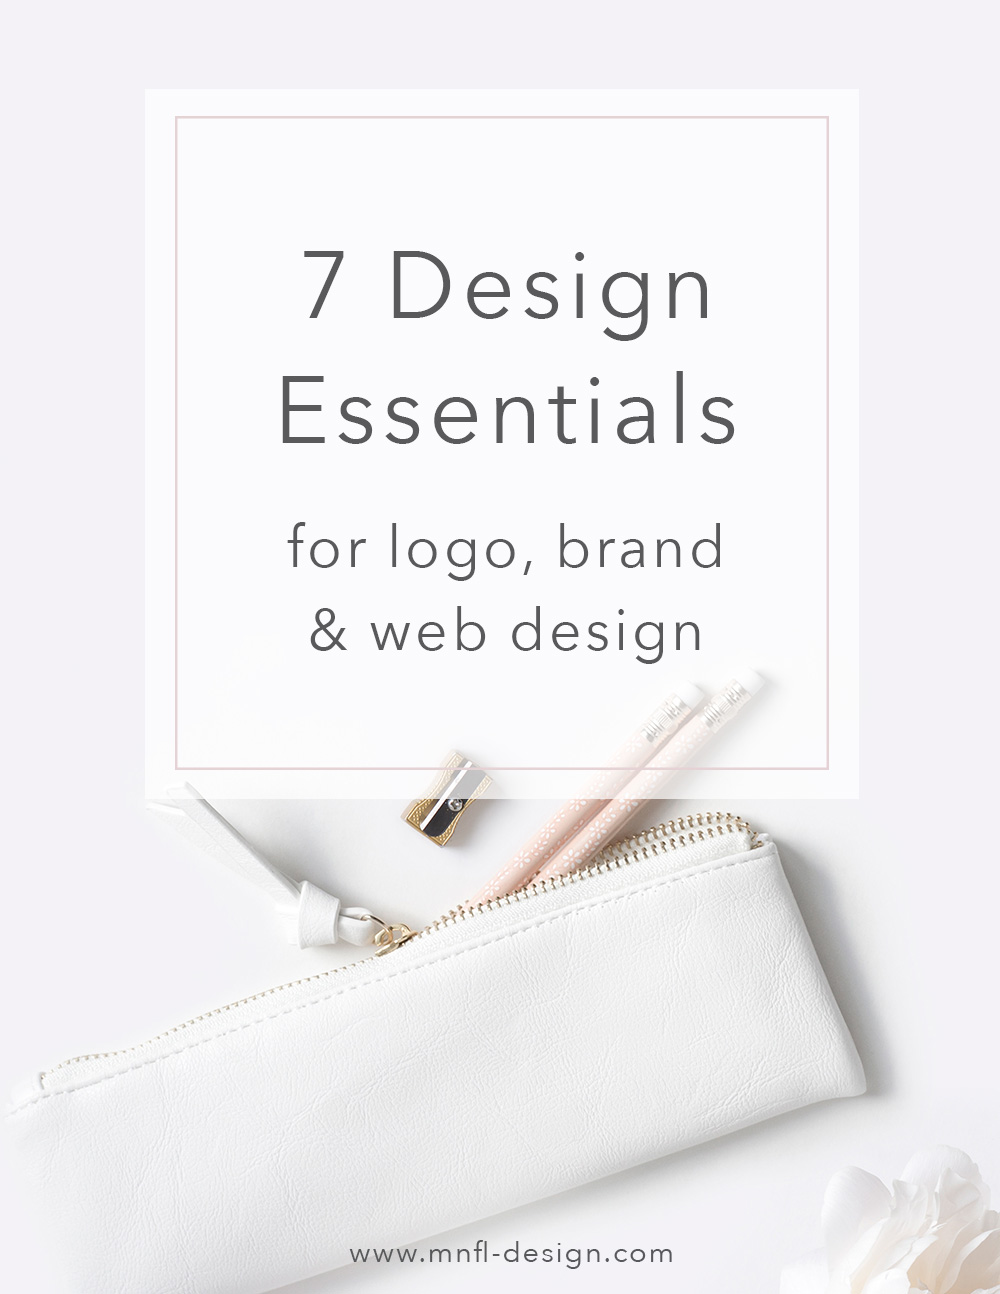 My 7 Design Essentials for logo, brand & web design | MNFL Design